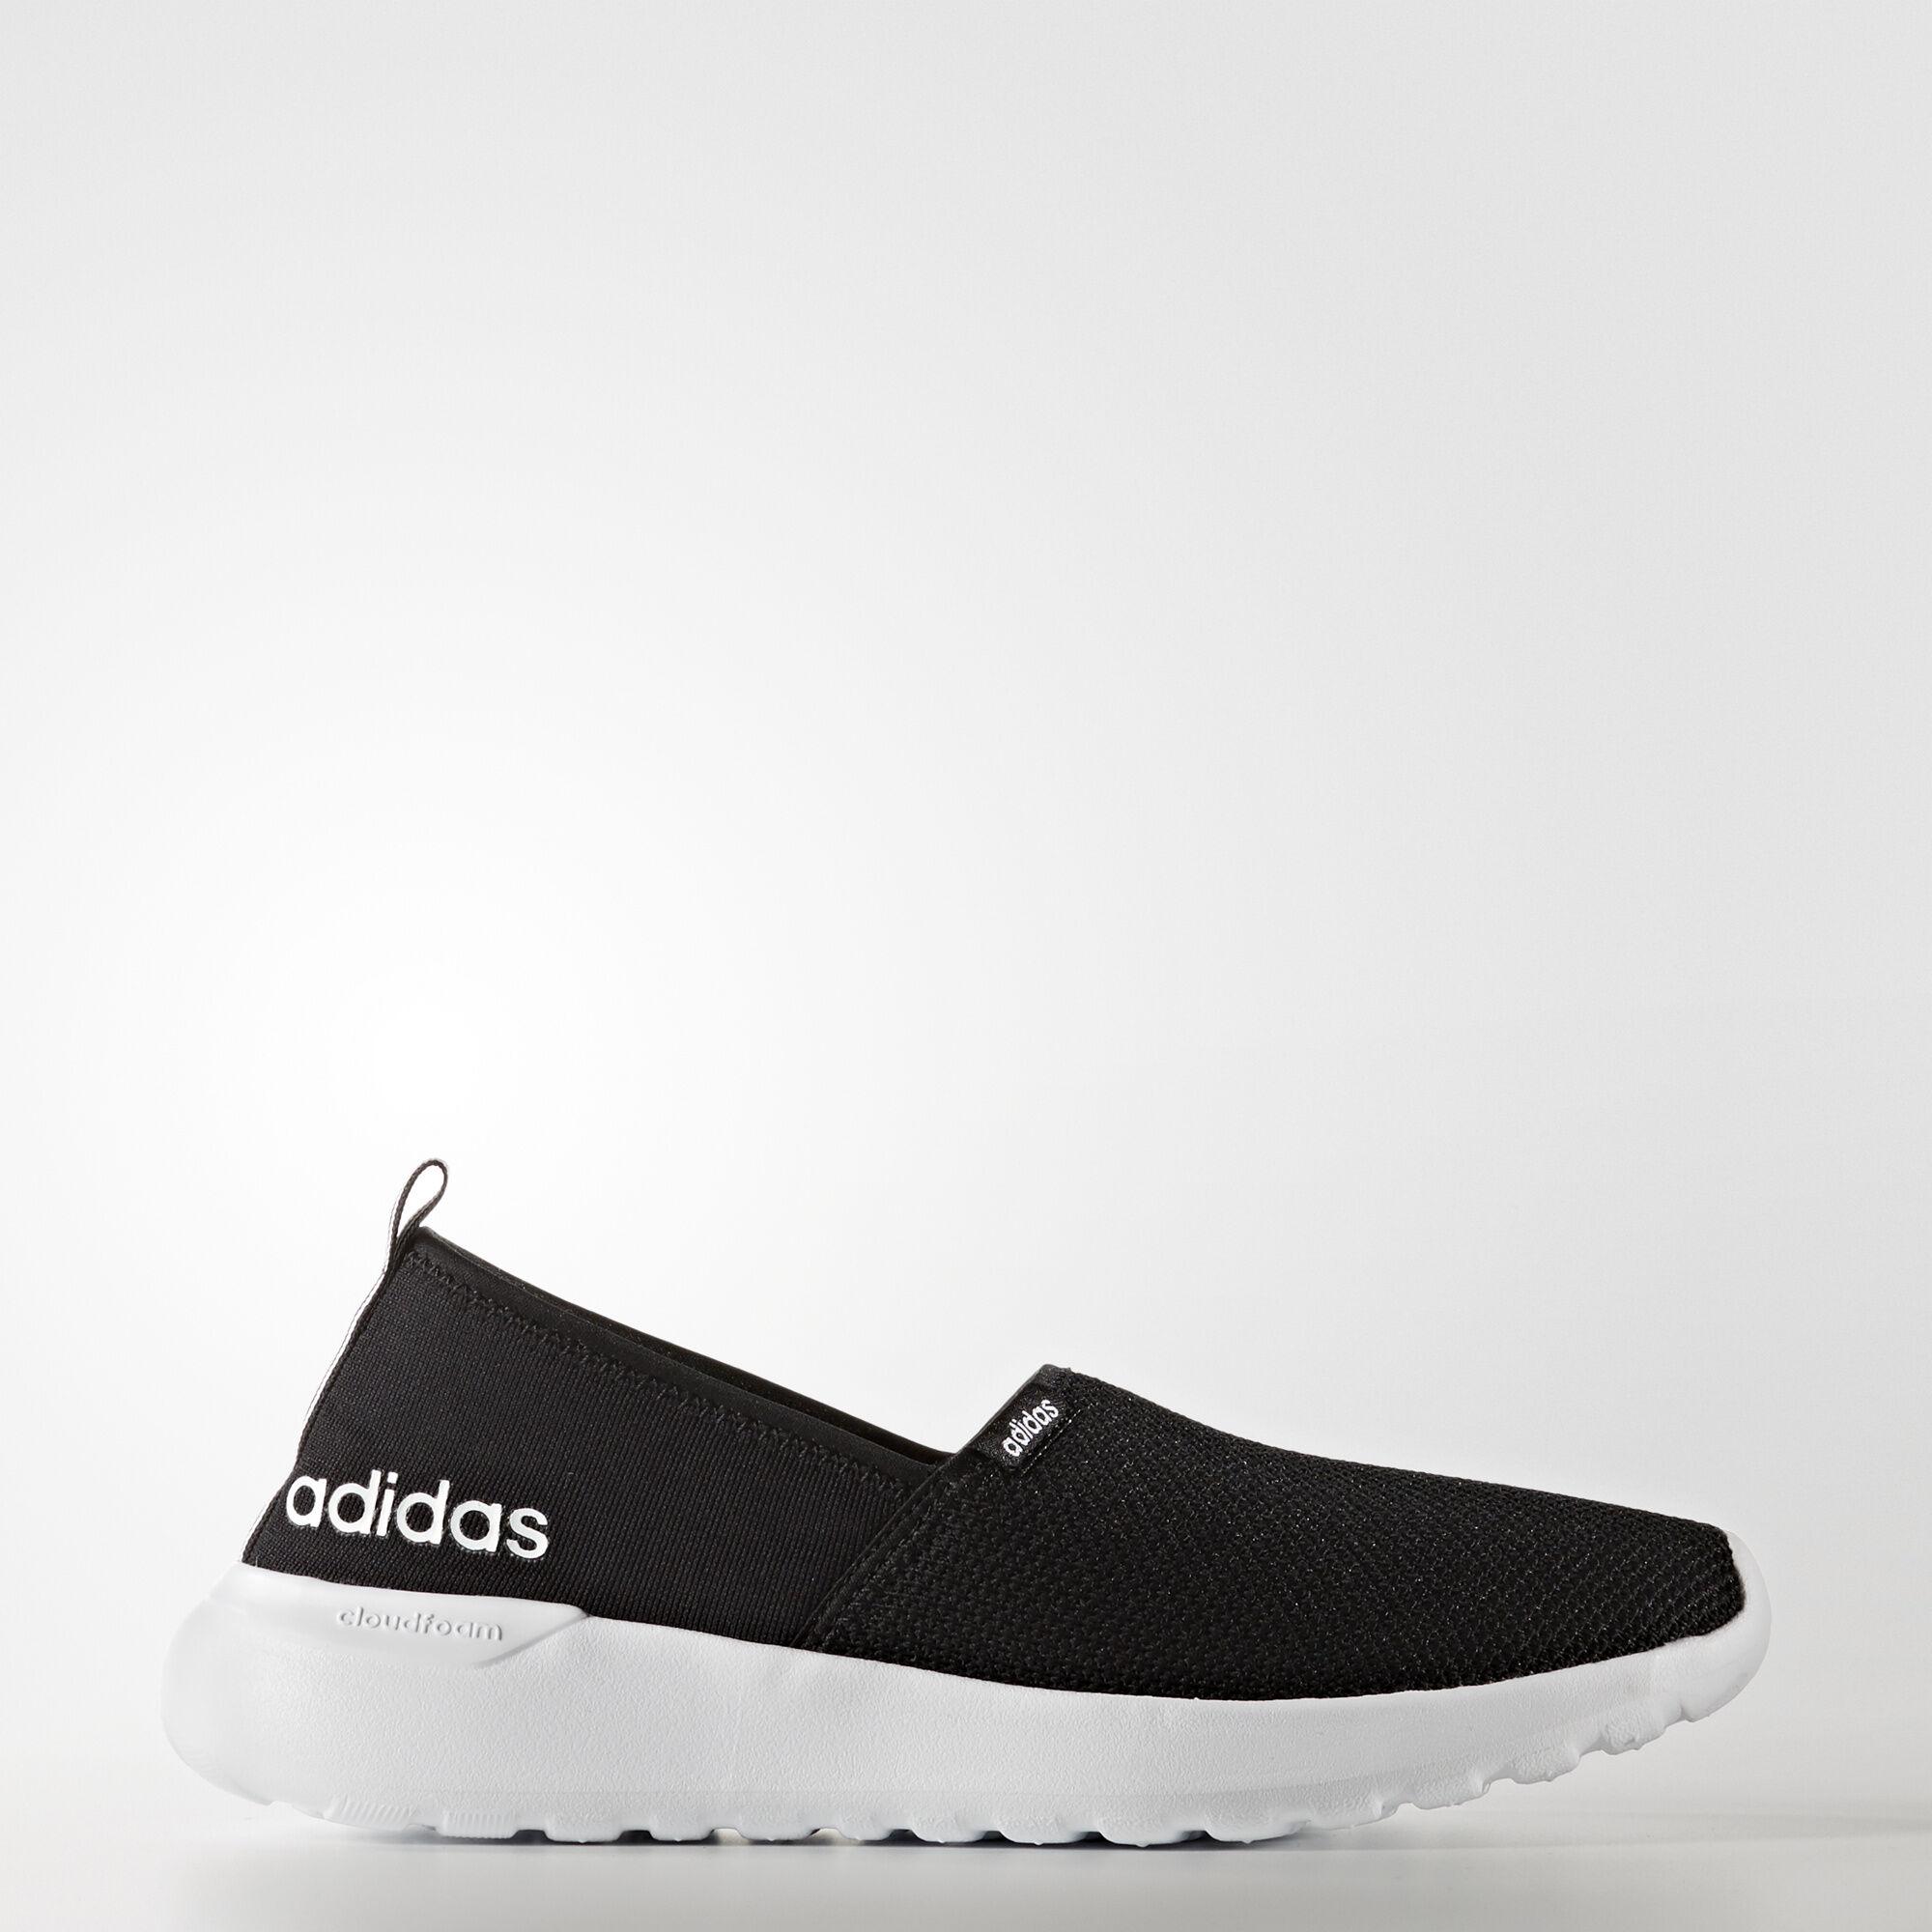 5dede64f6 adidas neo cloudfoam slip on